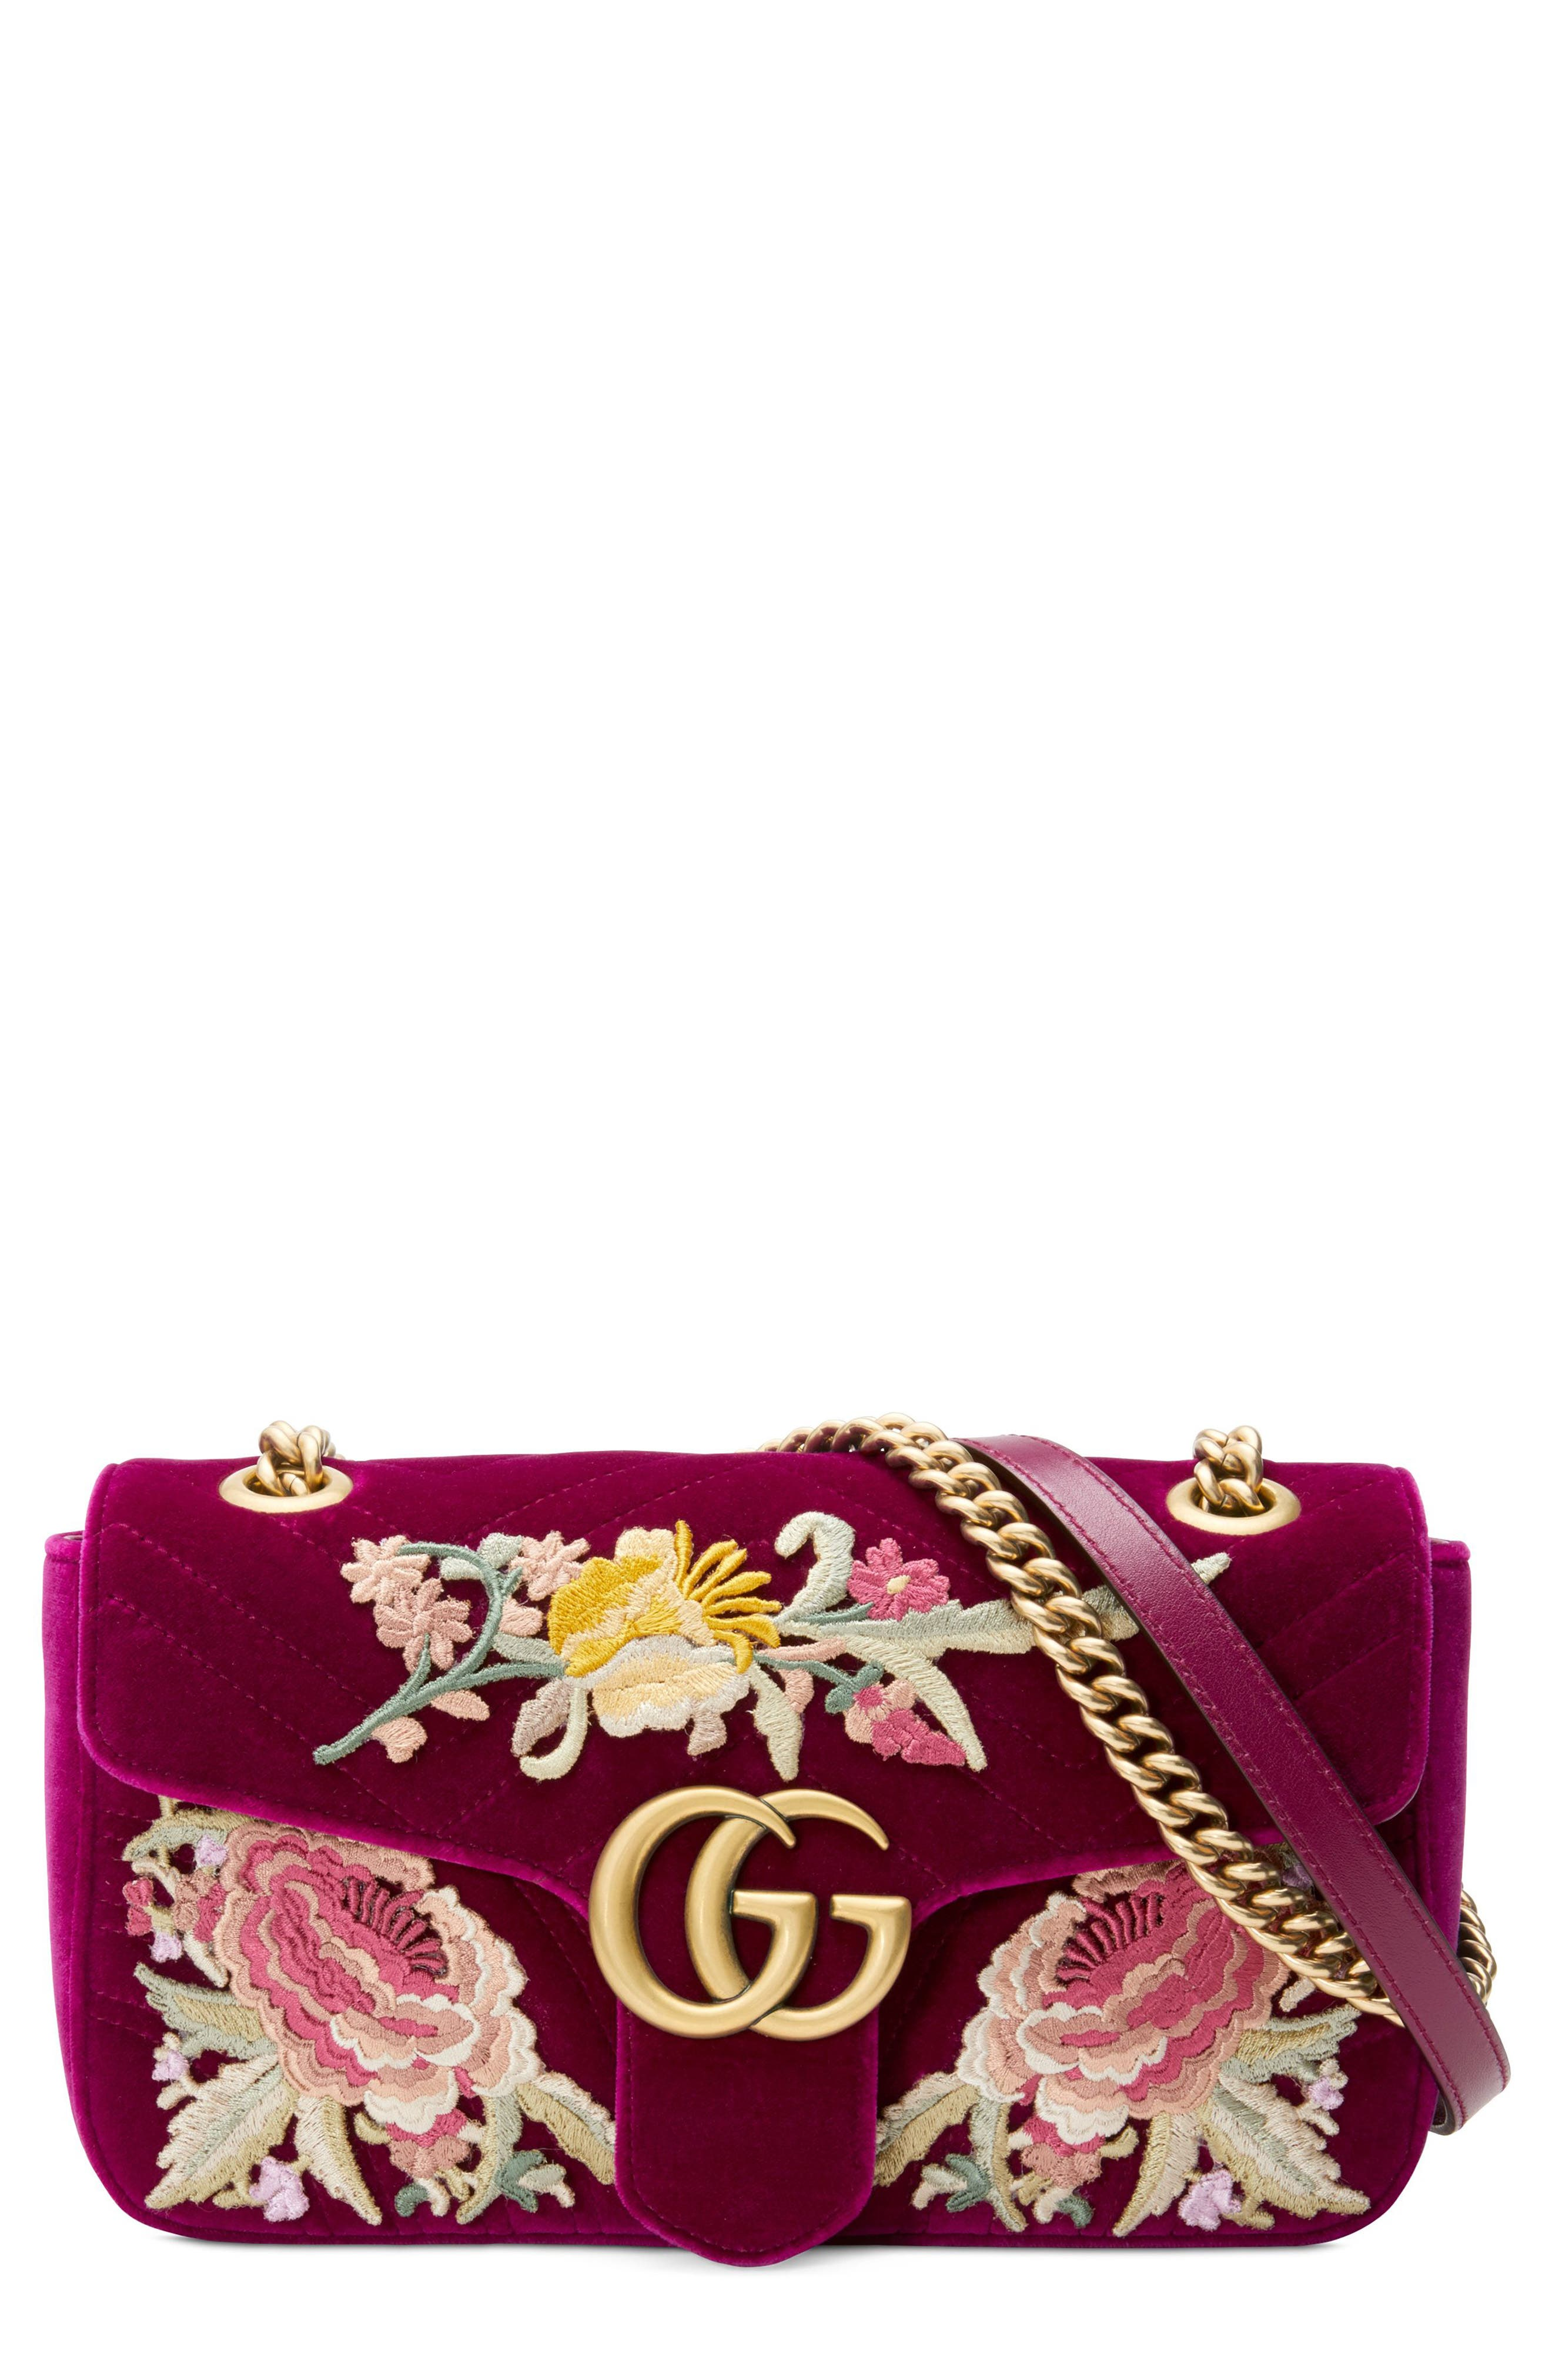 Small GG Marmont 2.0 Matelassé Velvet Shoulder Bag,                             Main thumbnail 1, color,                             Fuchsia/ Fuchsia